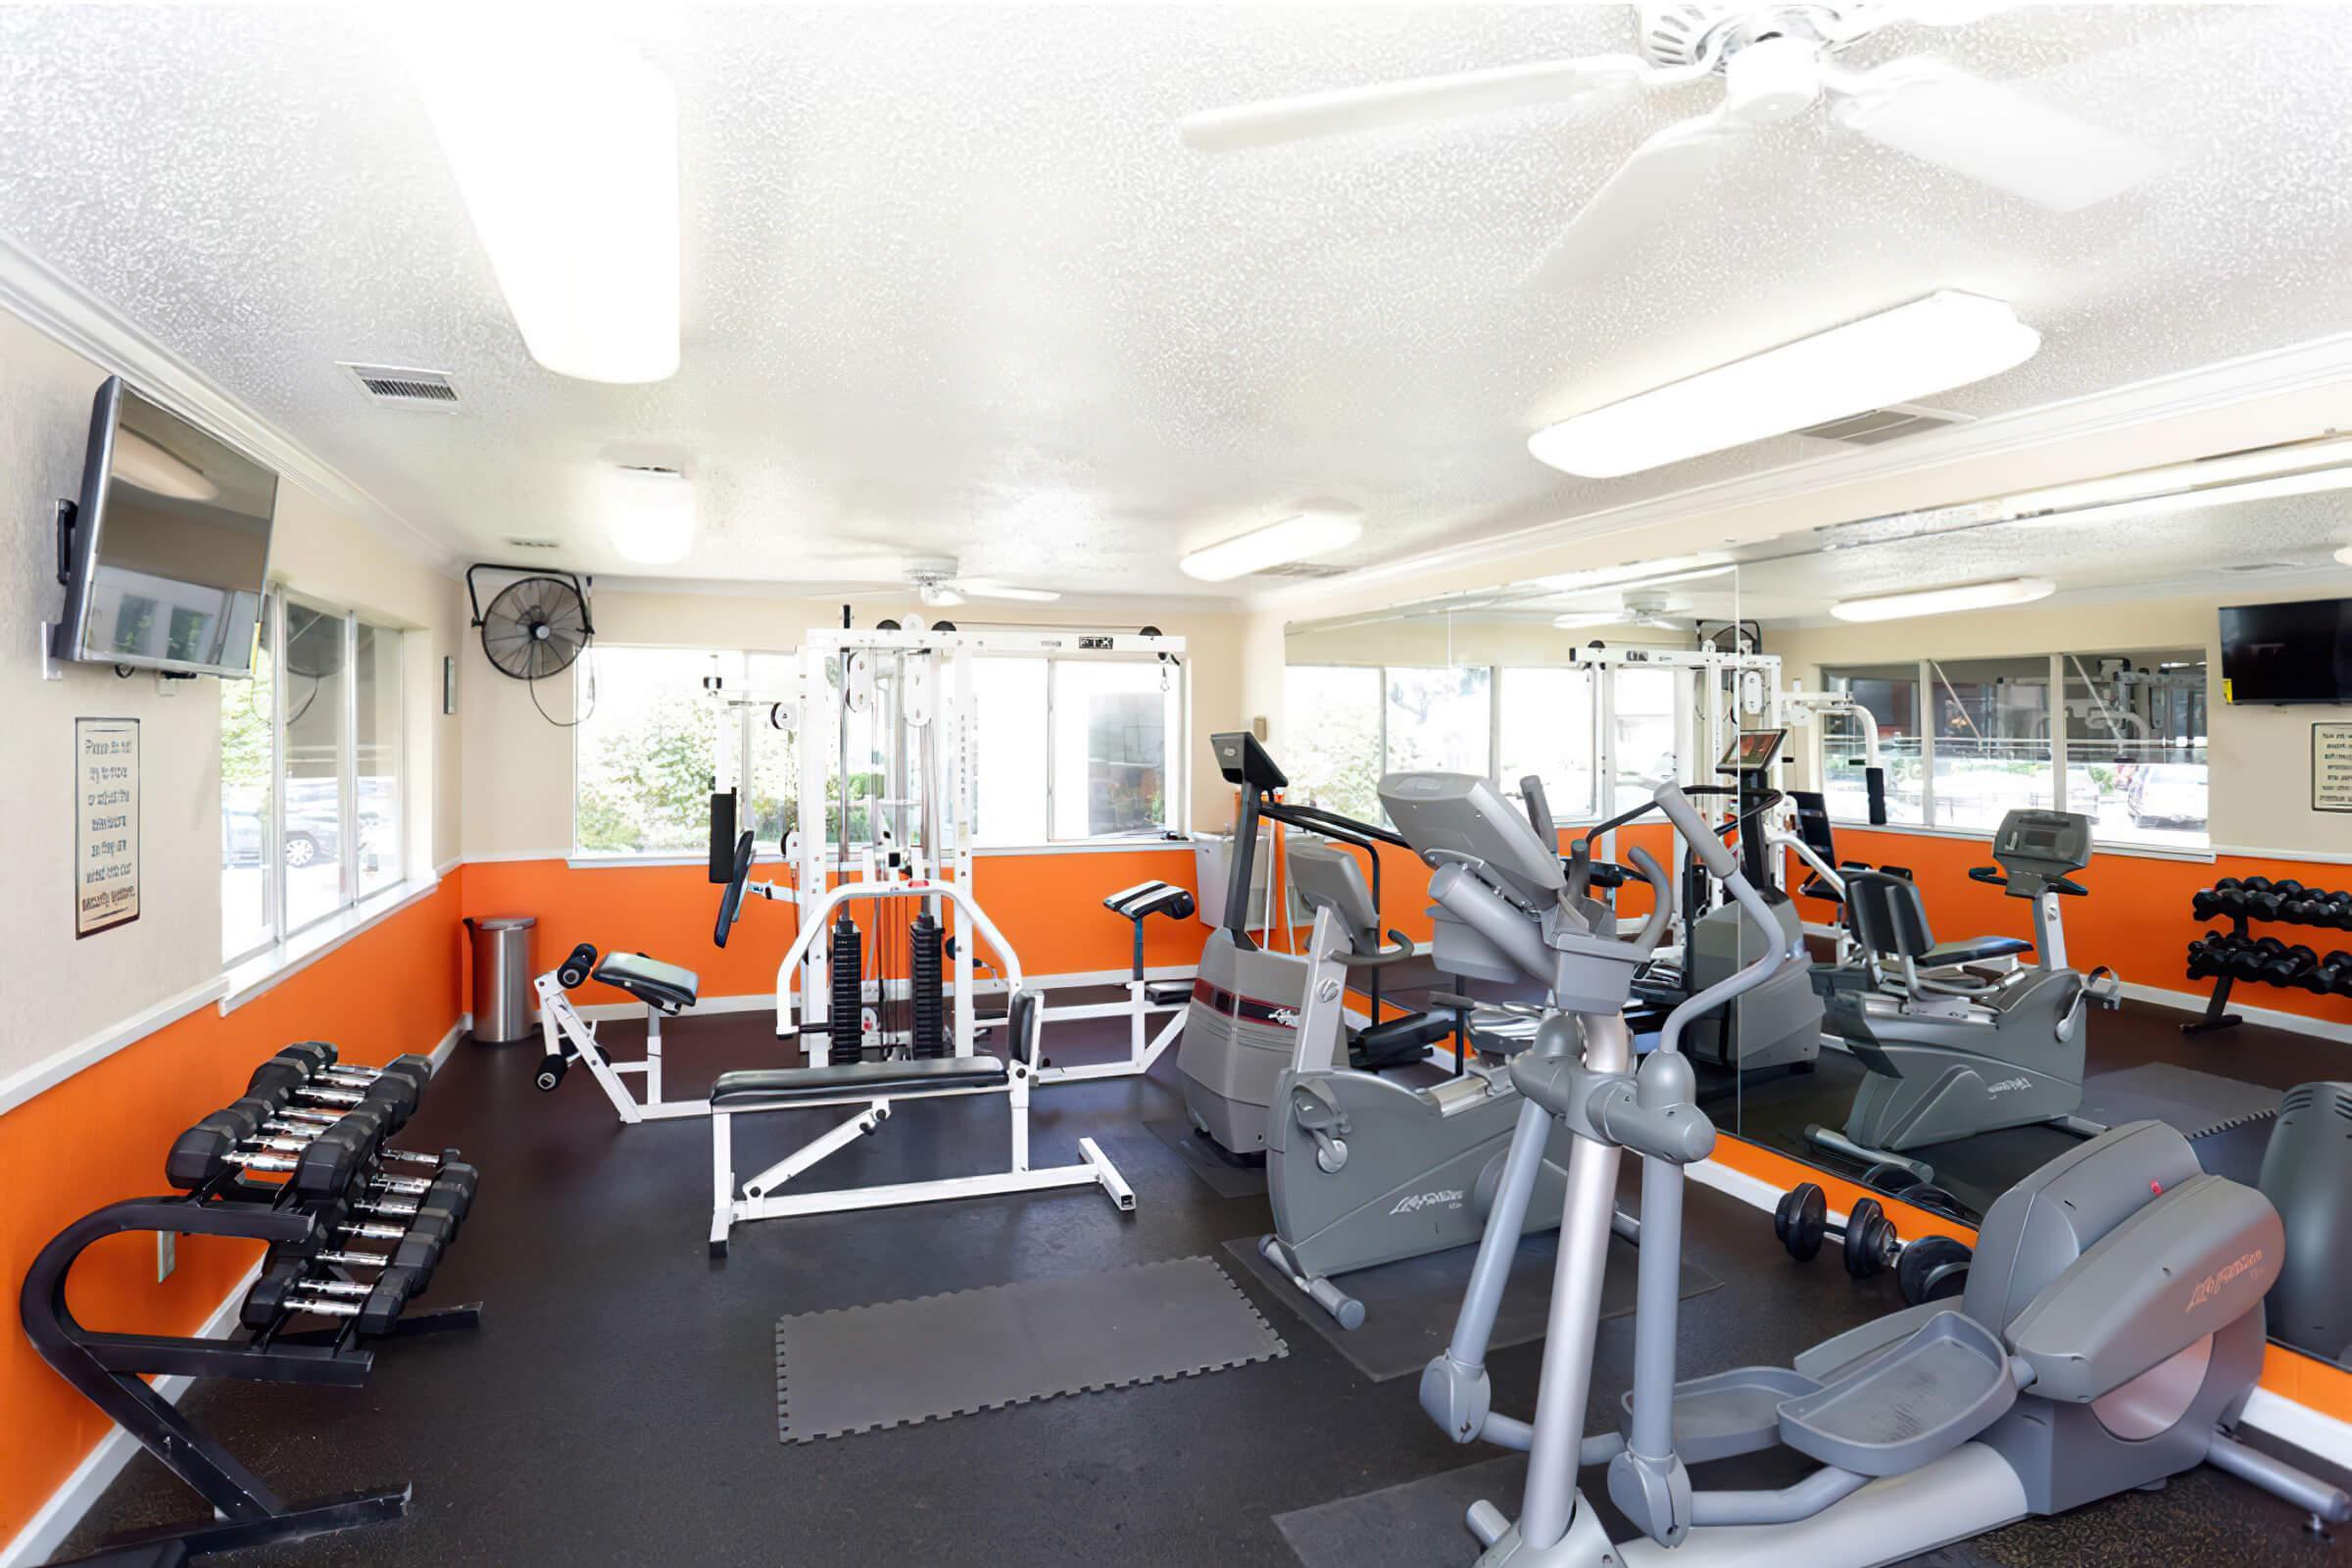 gym-width-2400px.jpg